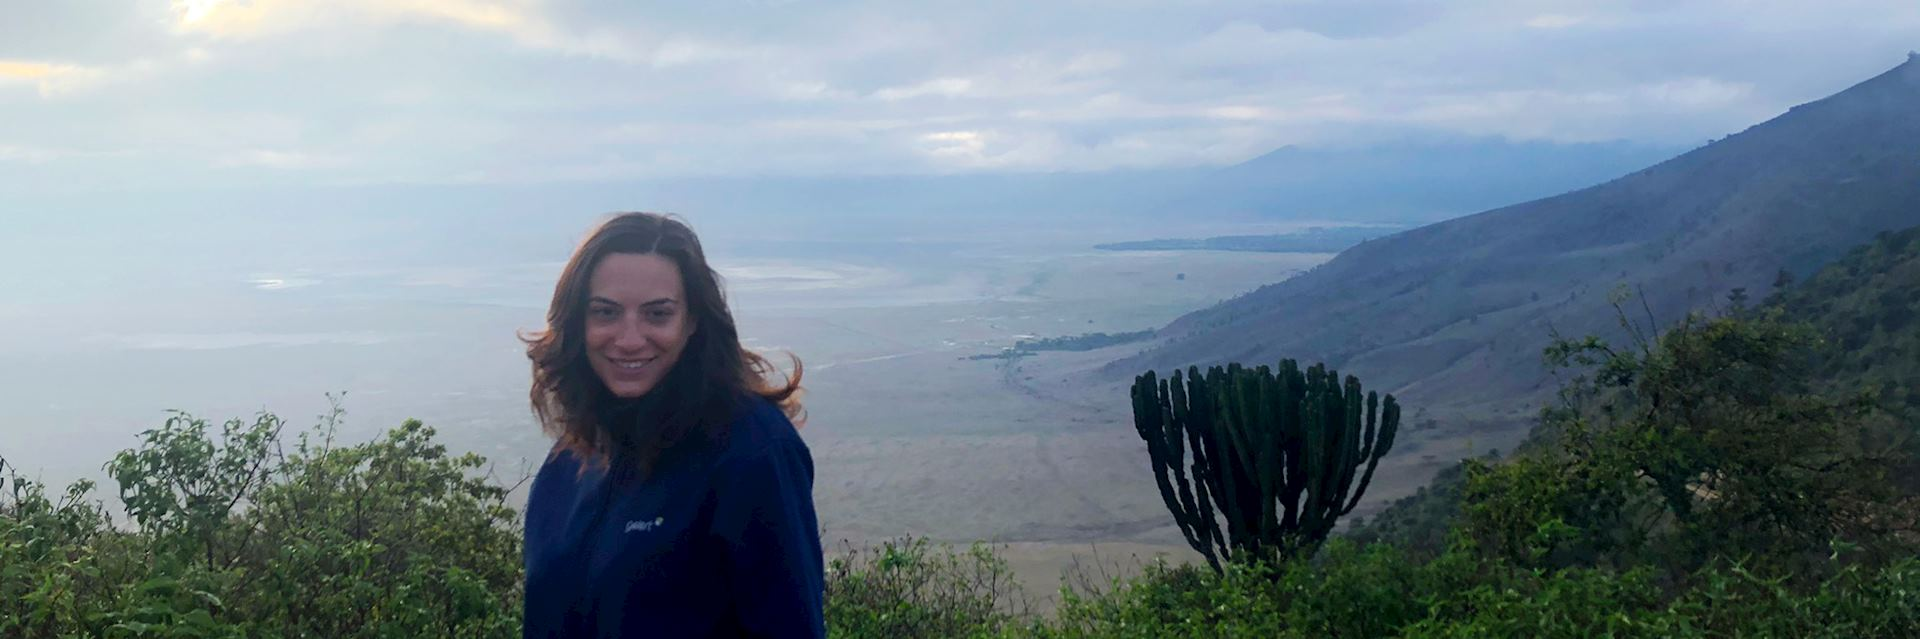 Giovanna at the Ngorongoro Crater